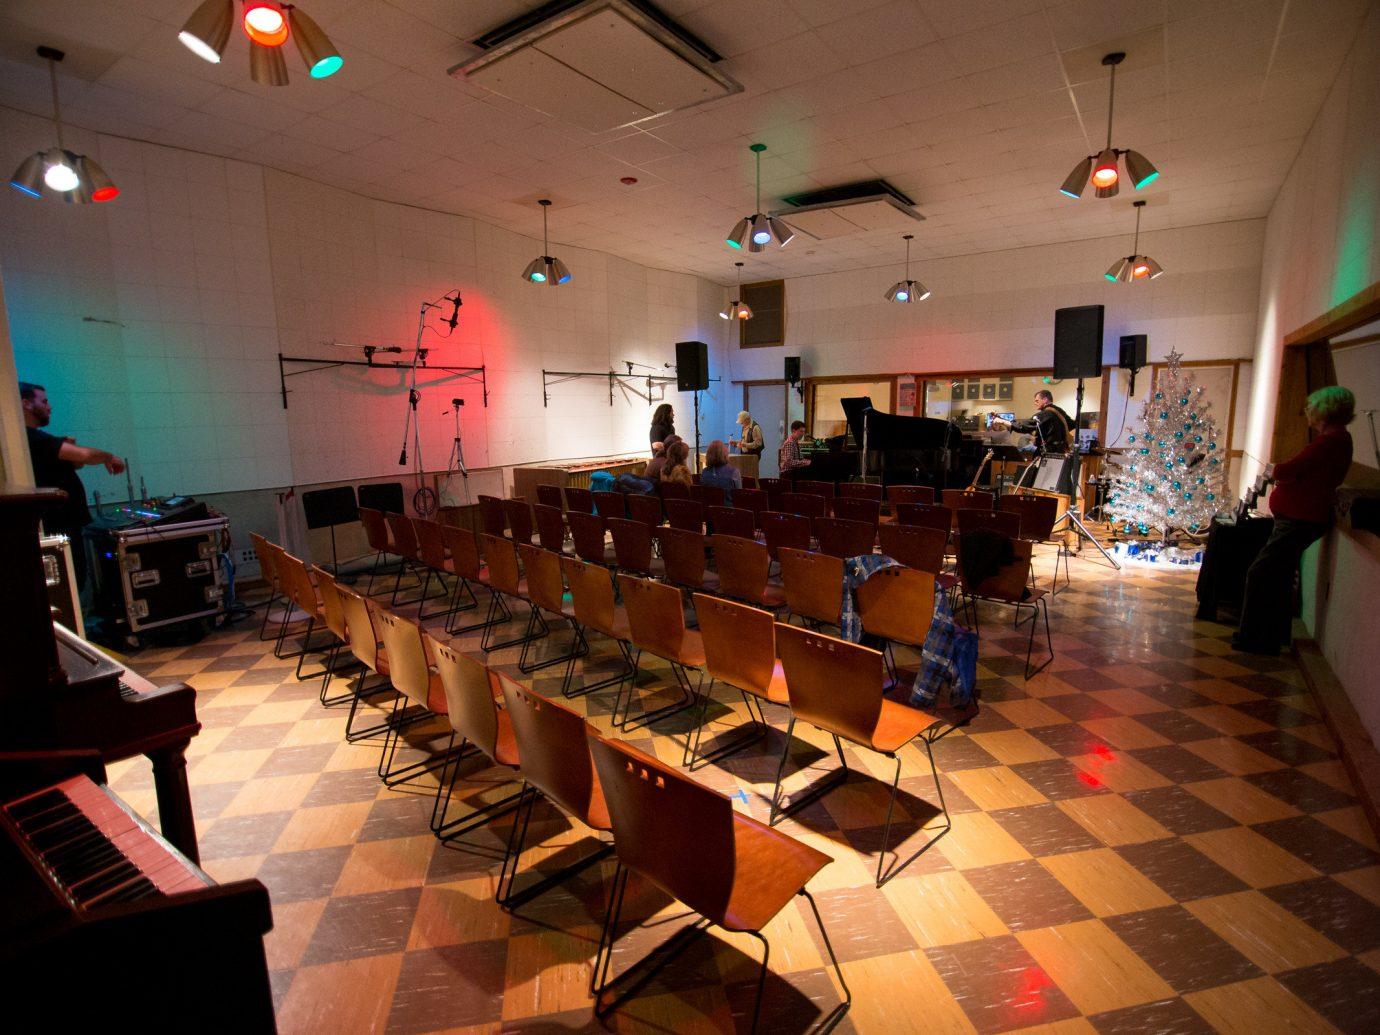 Trip Ideas floor indoor function hall restaurant light meal interior design furniture several